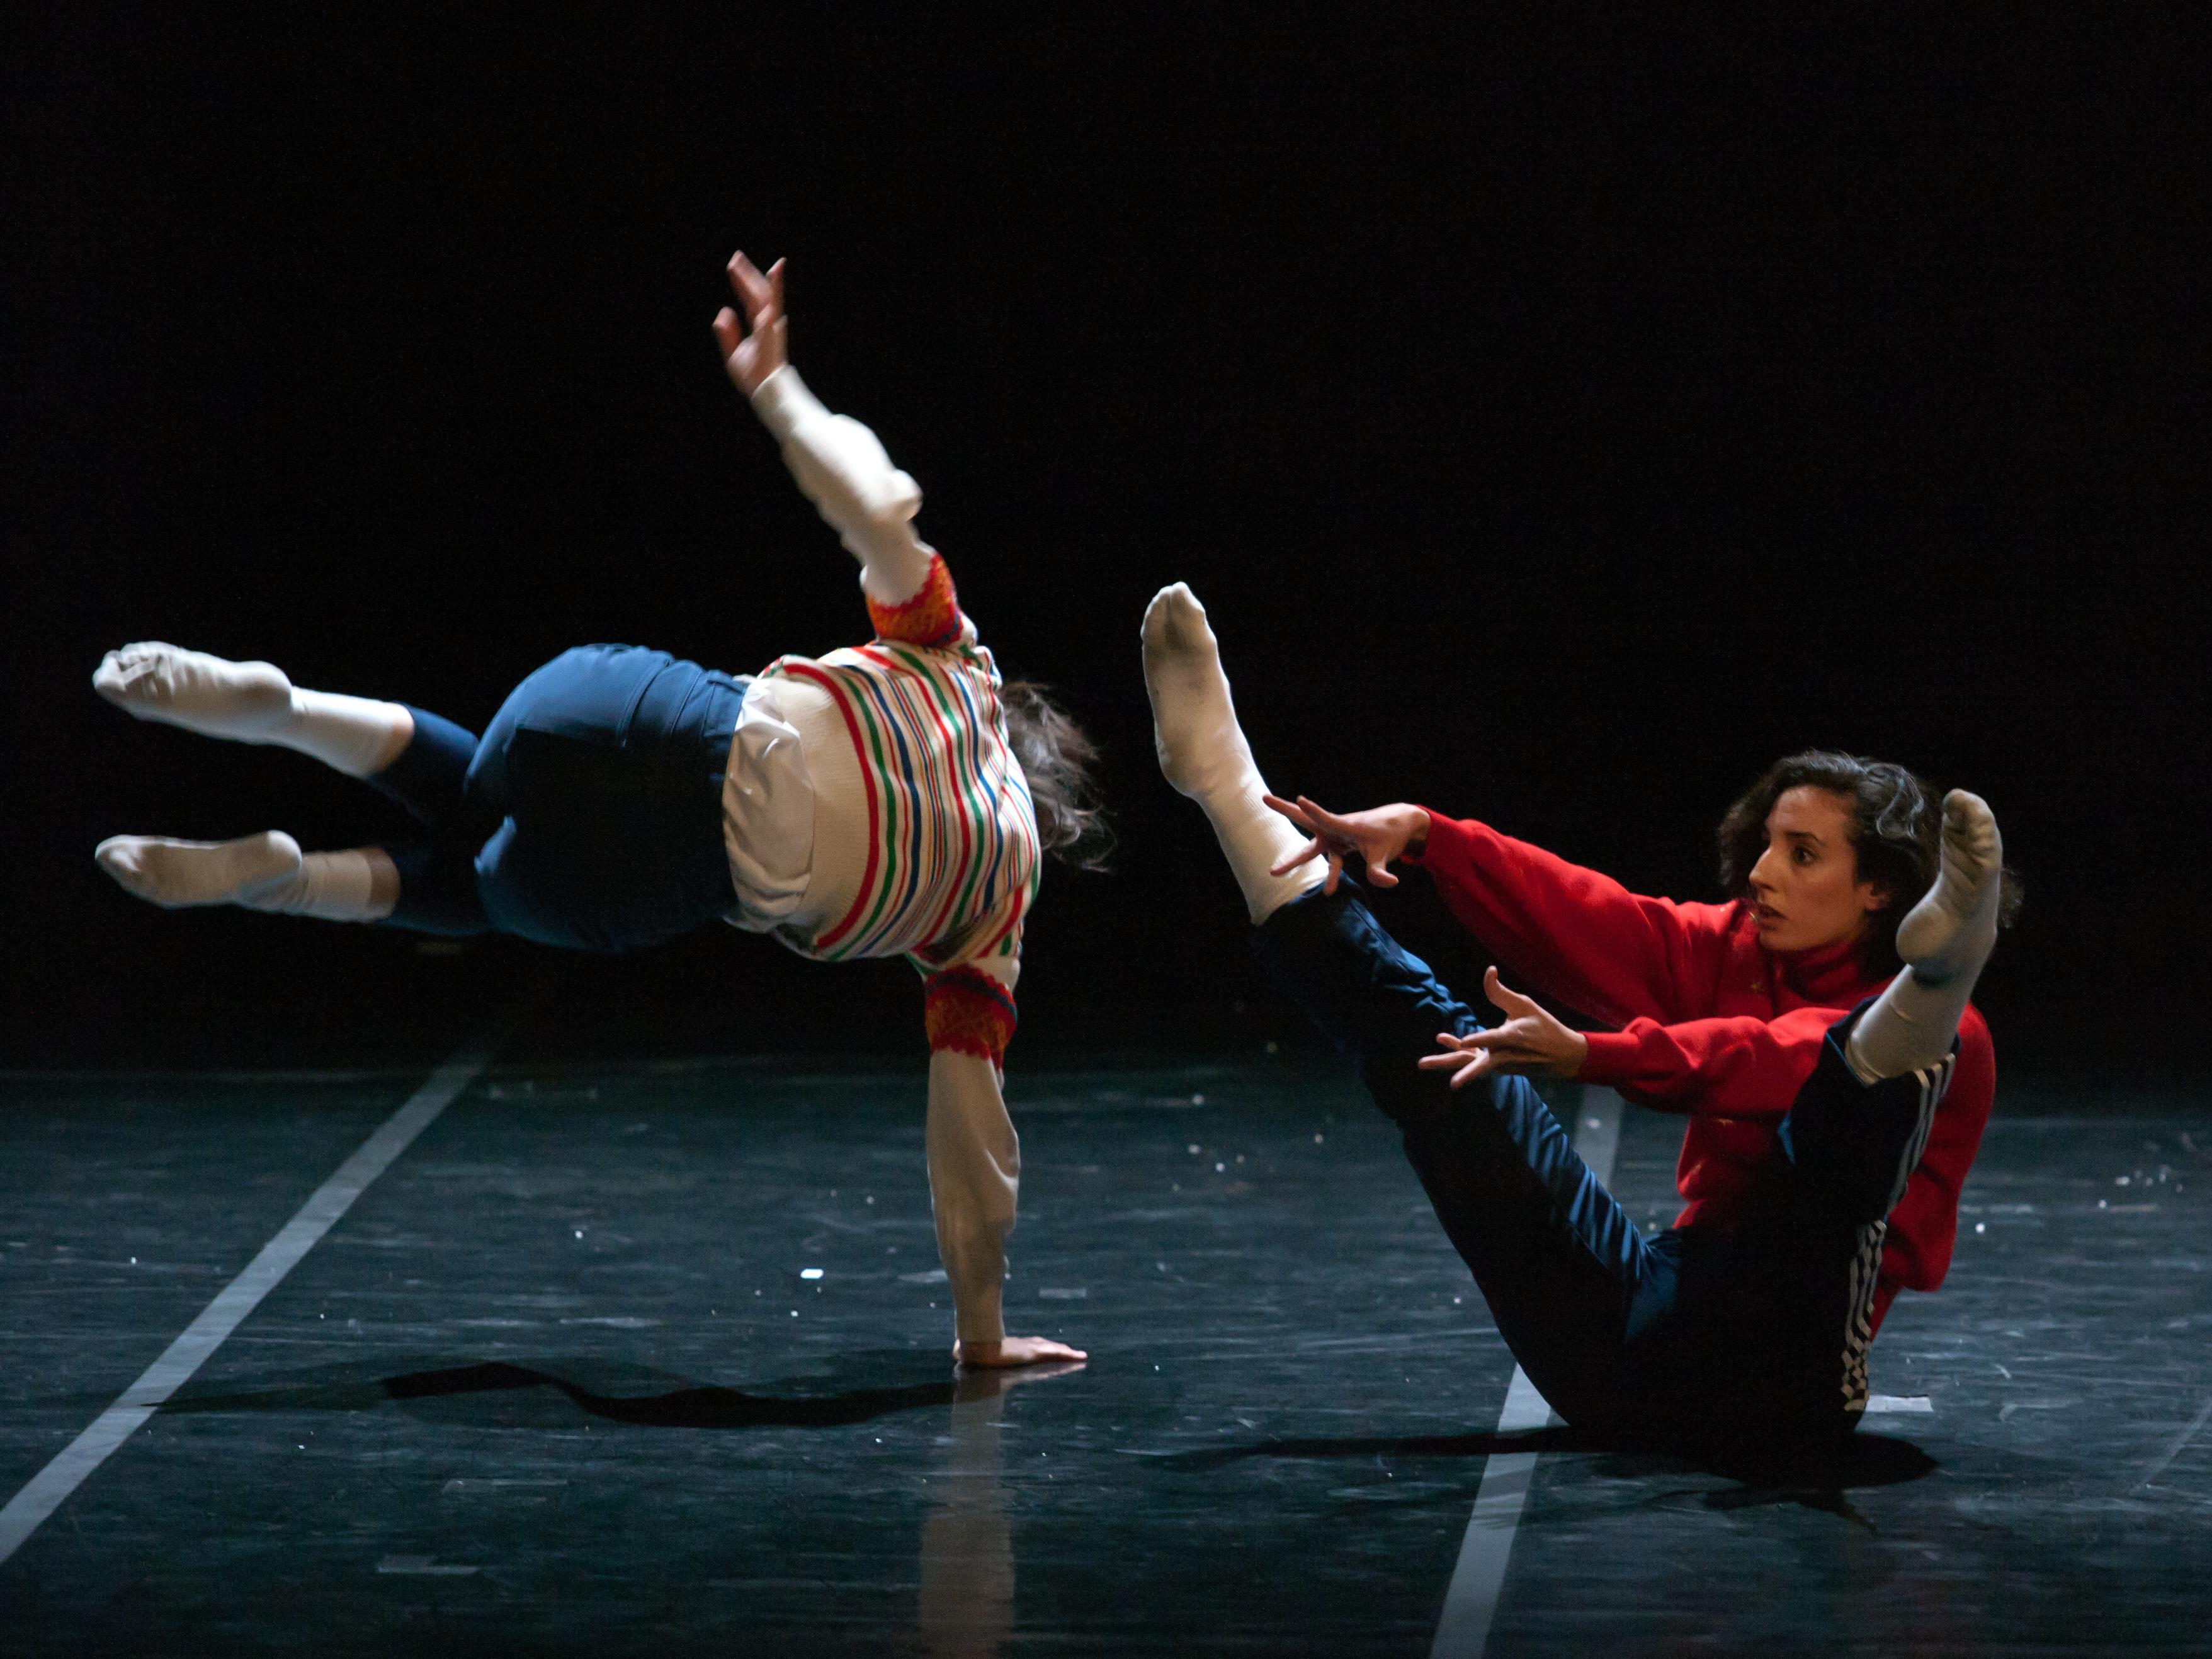 http://www.danzaurbana.eu/associazione/wp-content/uploads/2018/05/Masdanza_Veronal_3_2015.jpg